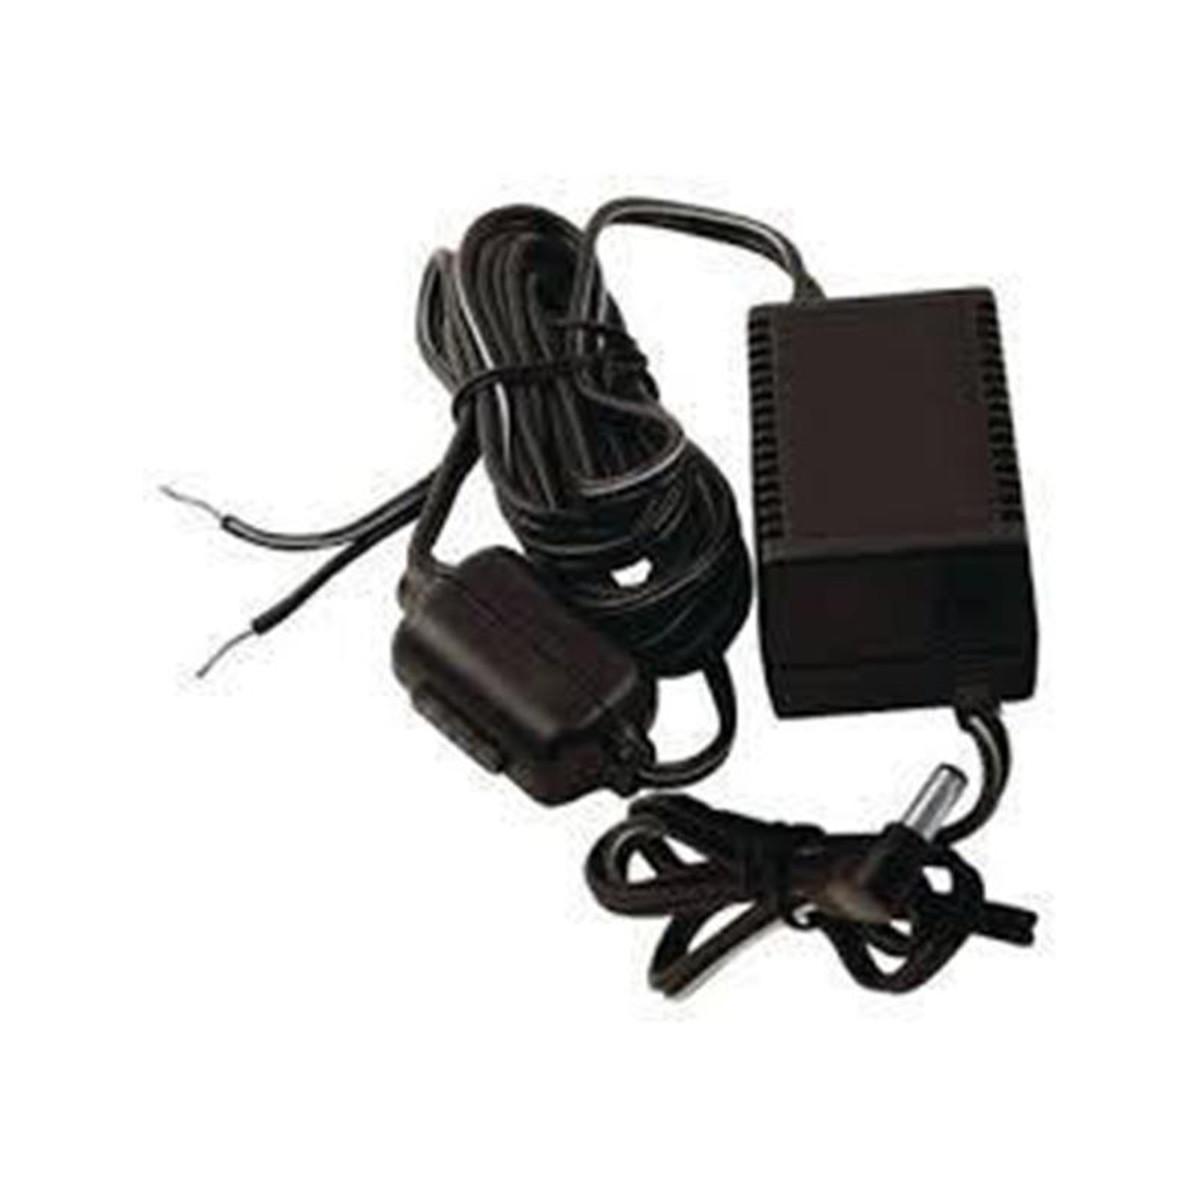 Wilson Electronics Wilson 5V/3A DC Fused Hardwire Power Supply w/ 2.5mm DC Plug - 851111